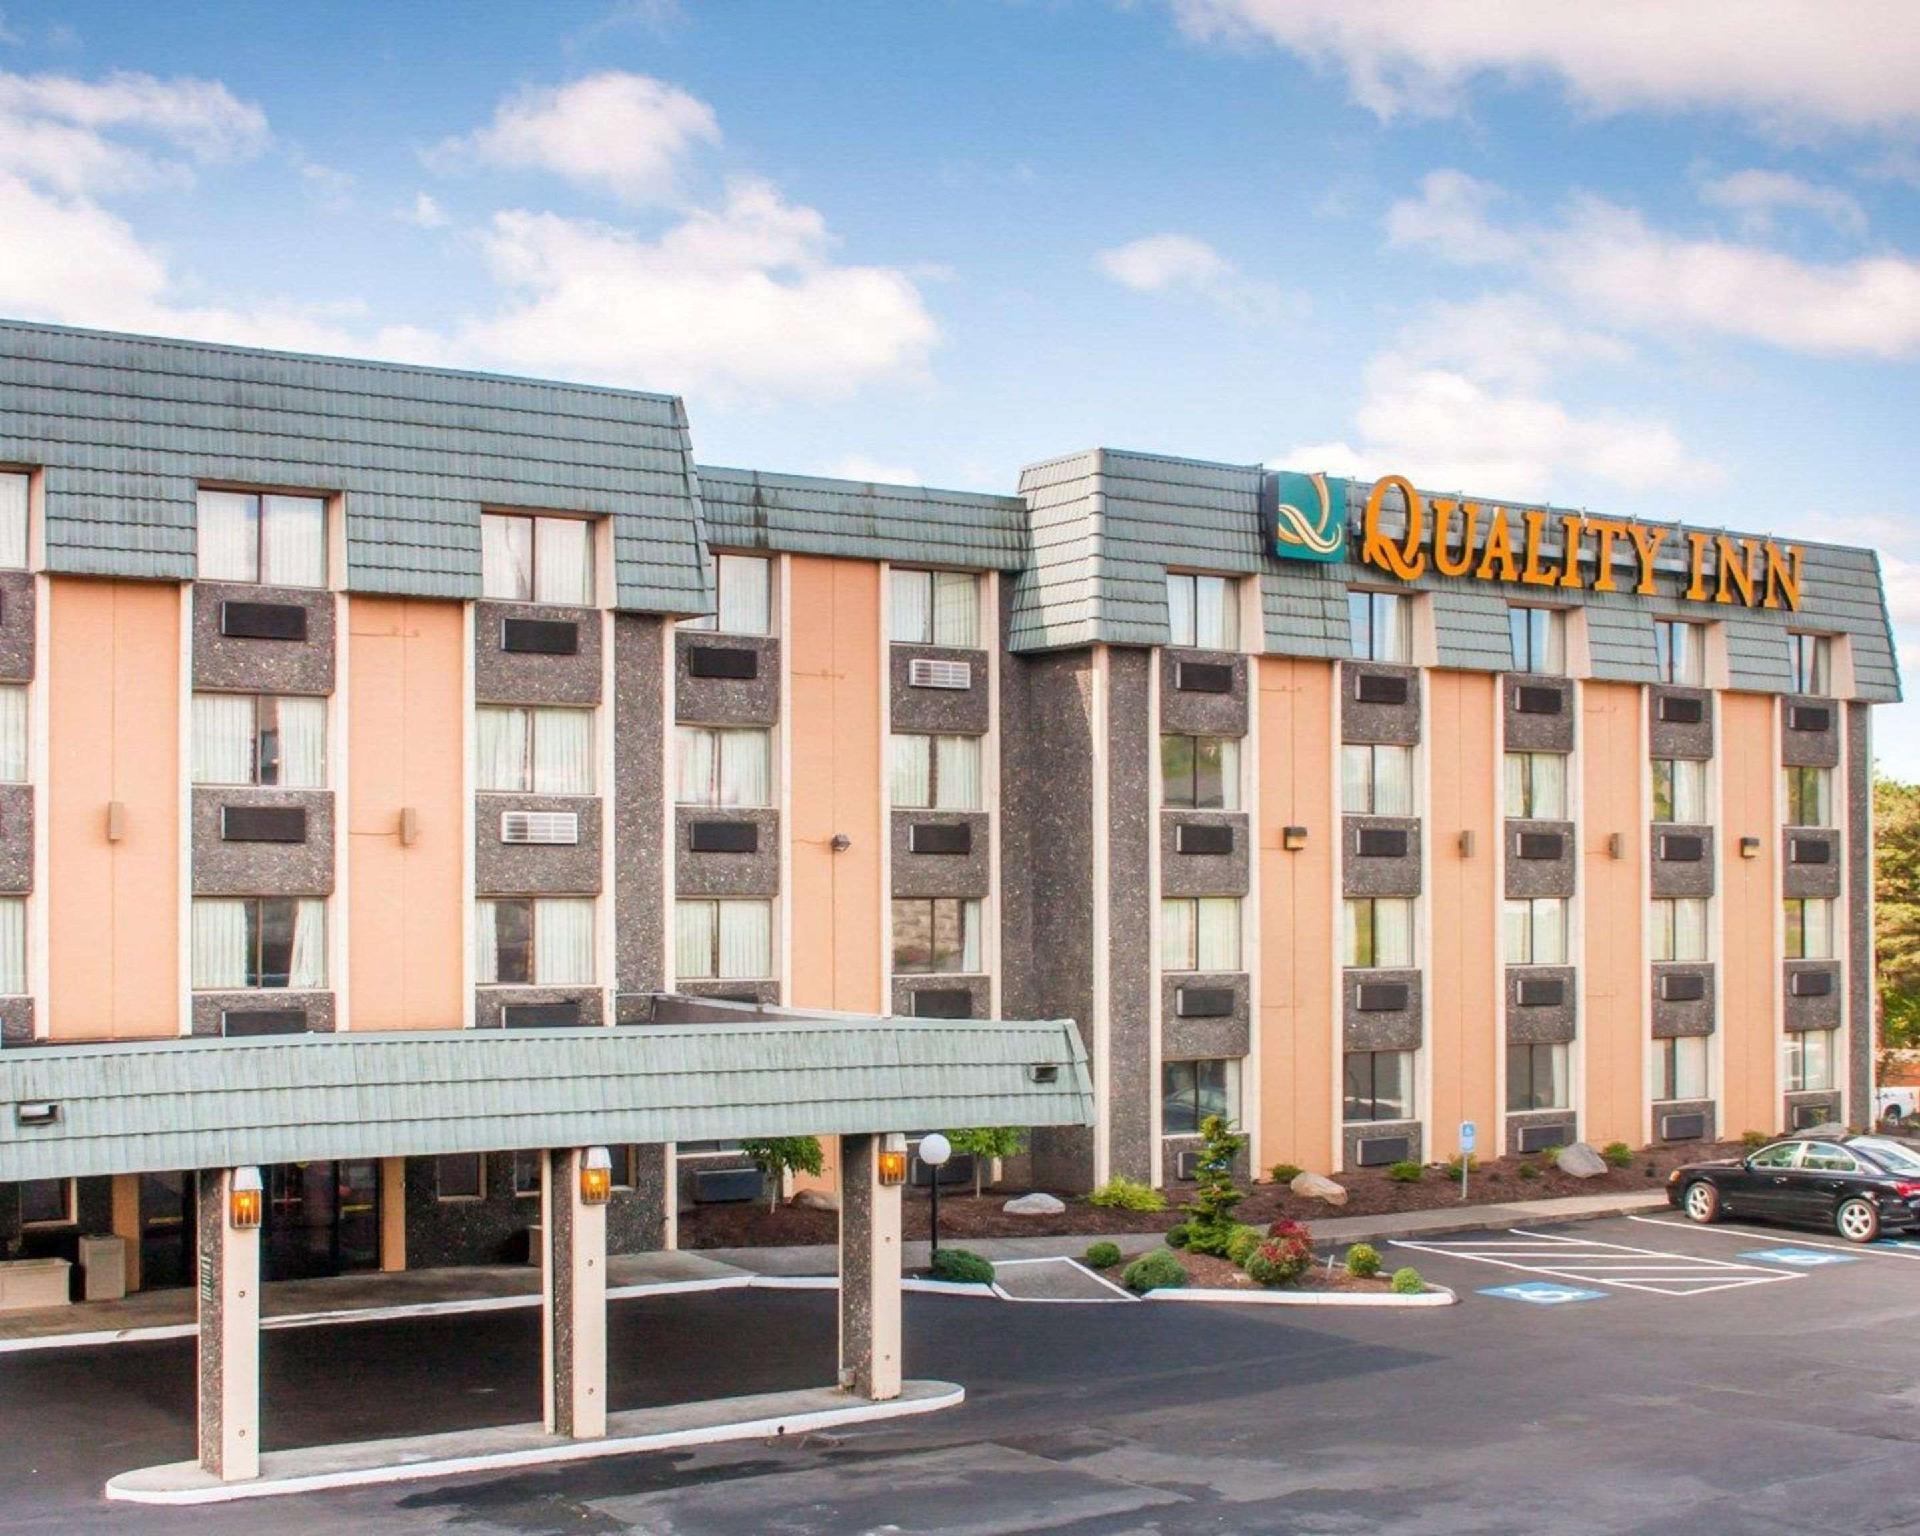 Price Quality Inn Tigard - Portland Southwest